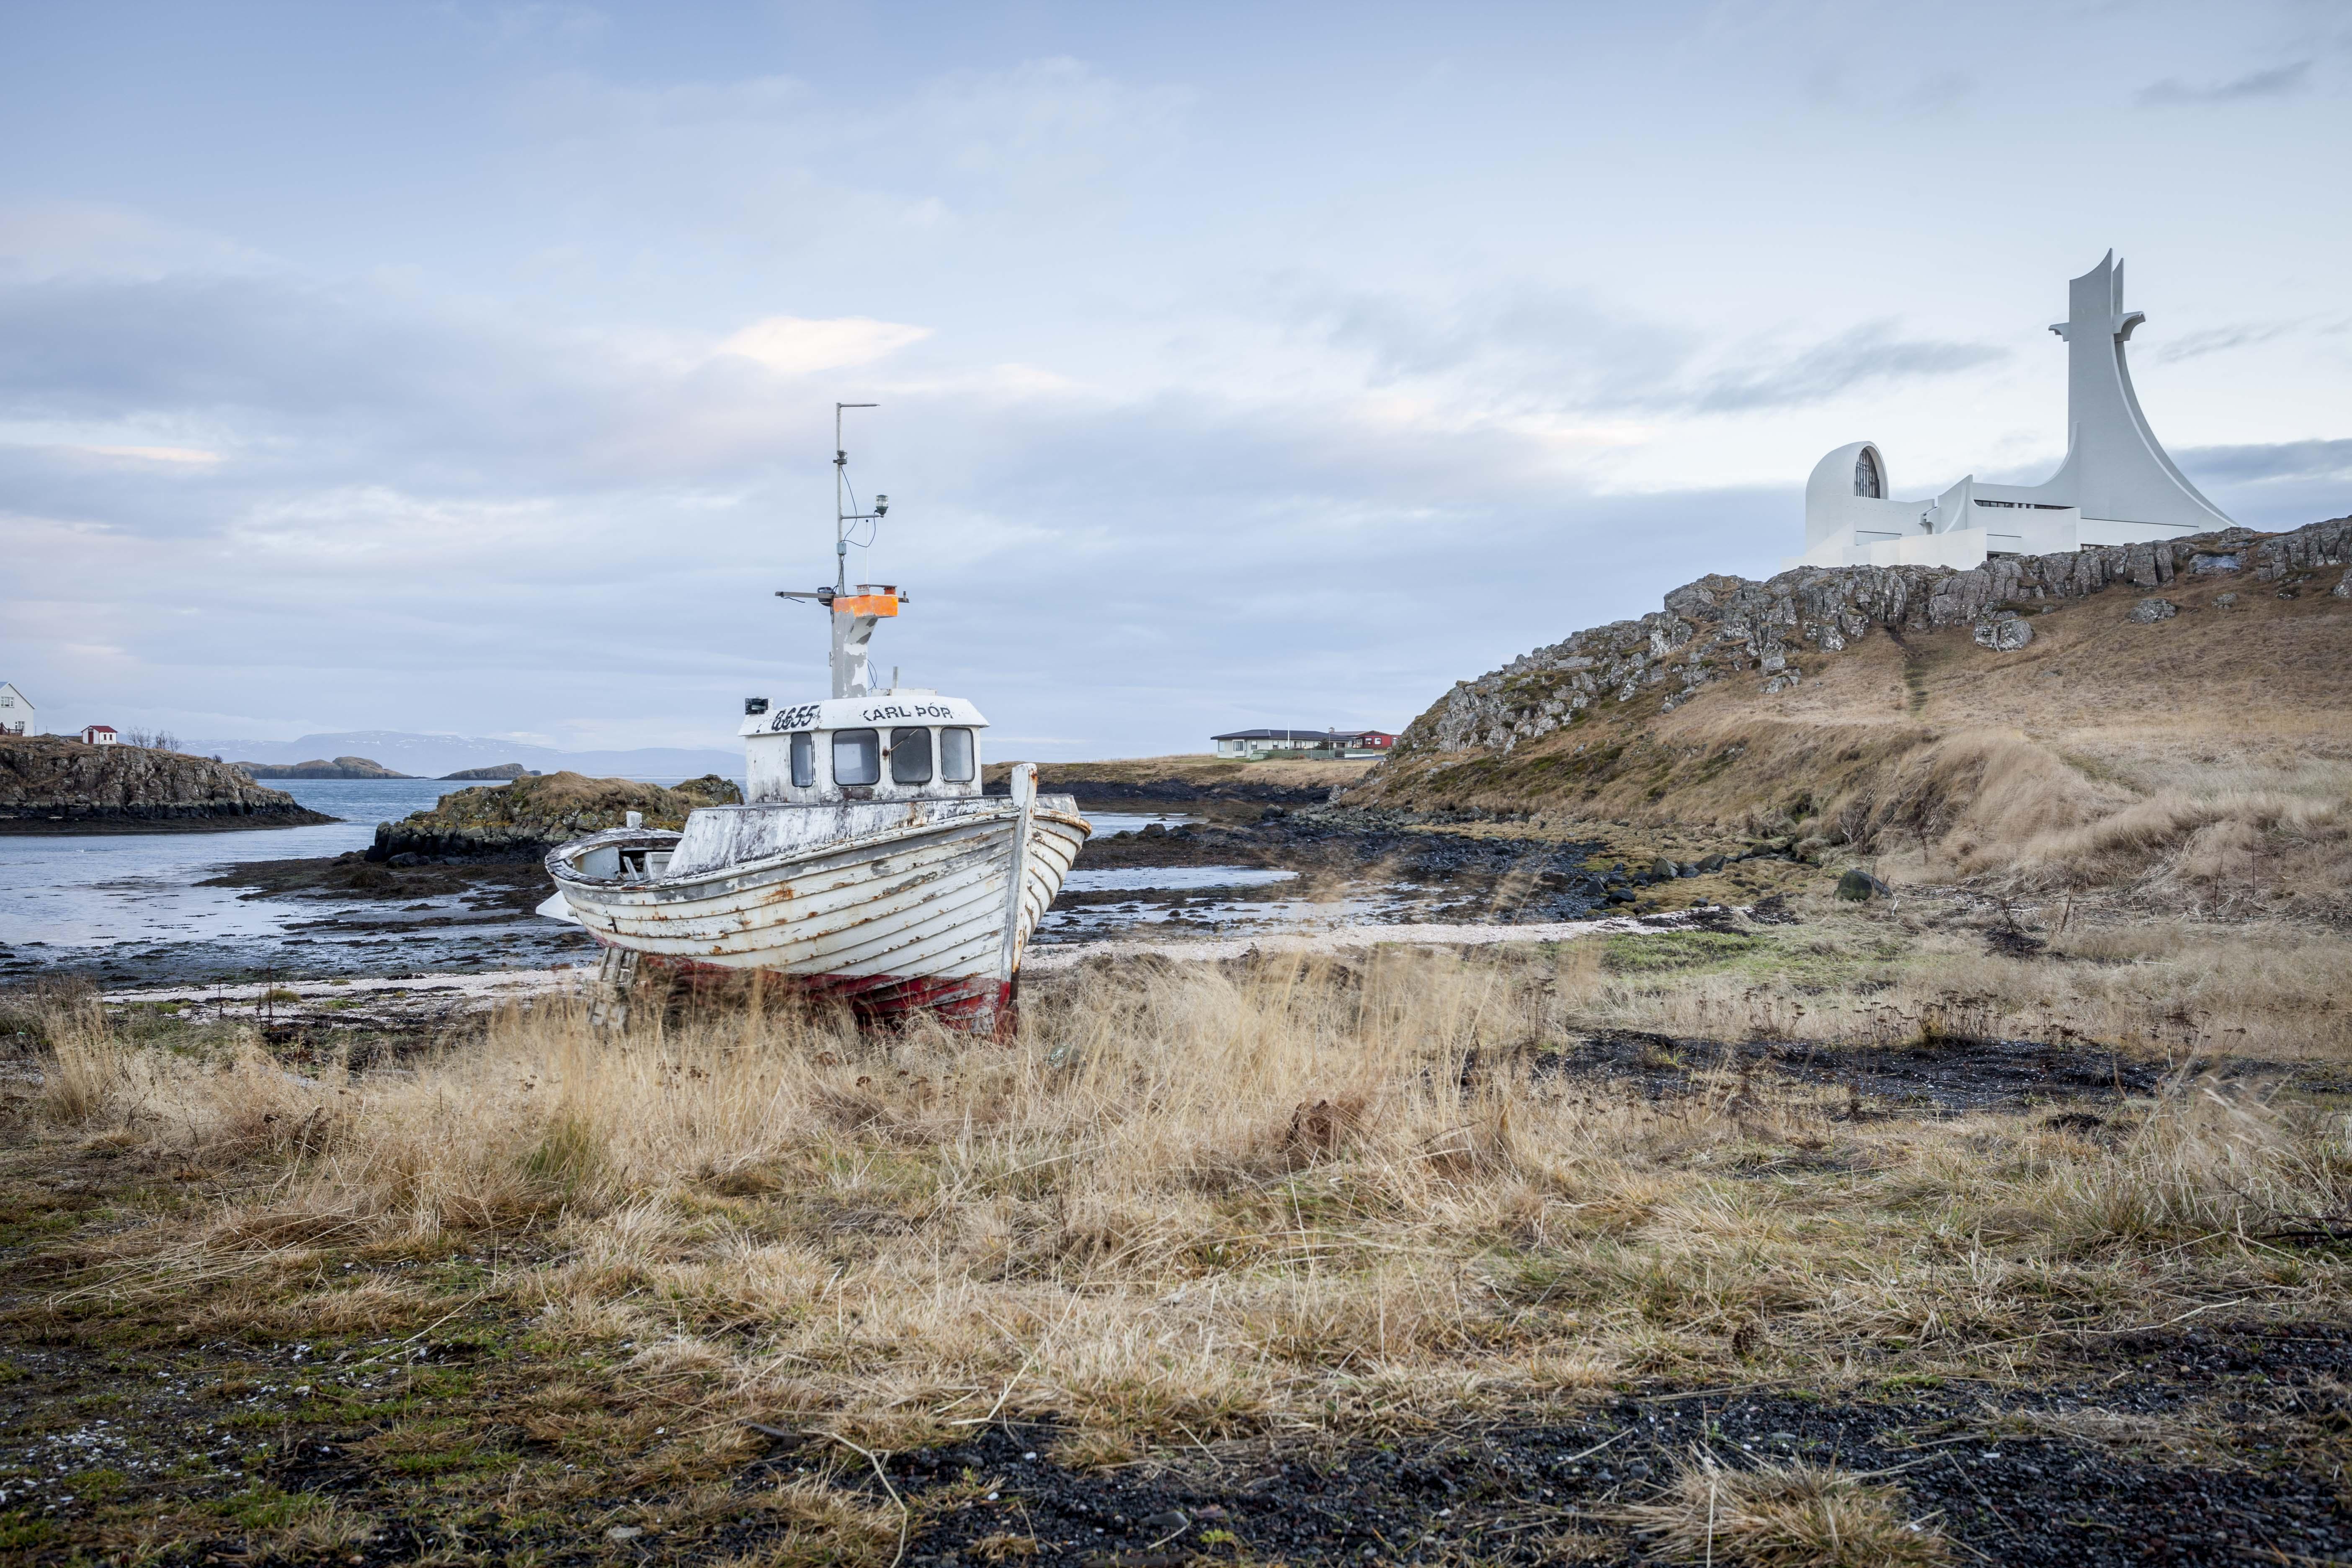 Stykkishólmur Boat, Iceland. 2016.